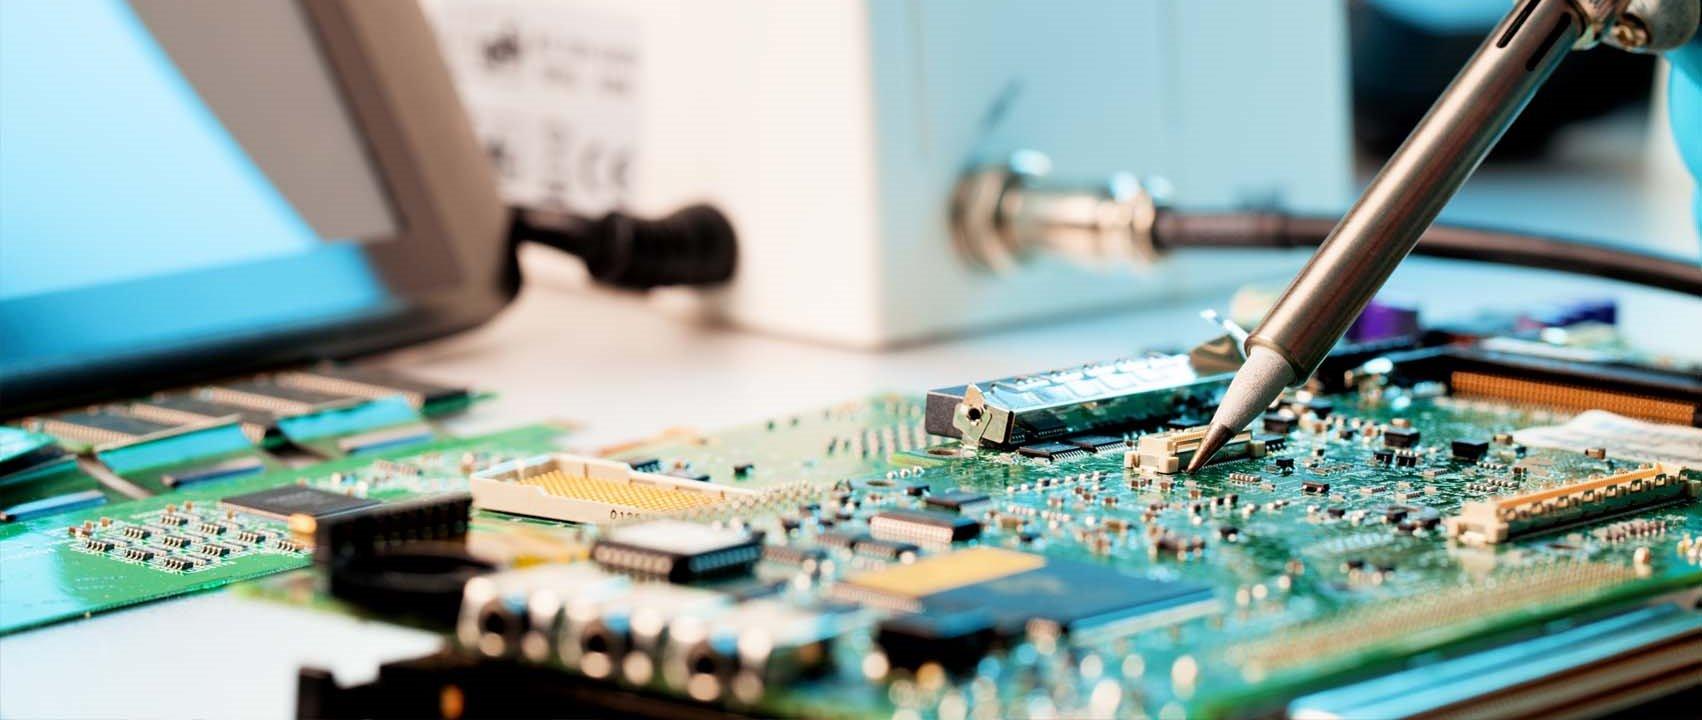 ремонт электроники. прошивка и перепрошивка процессора